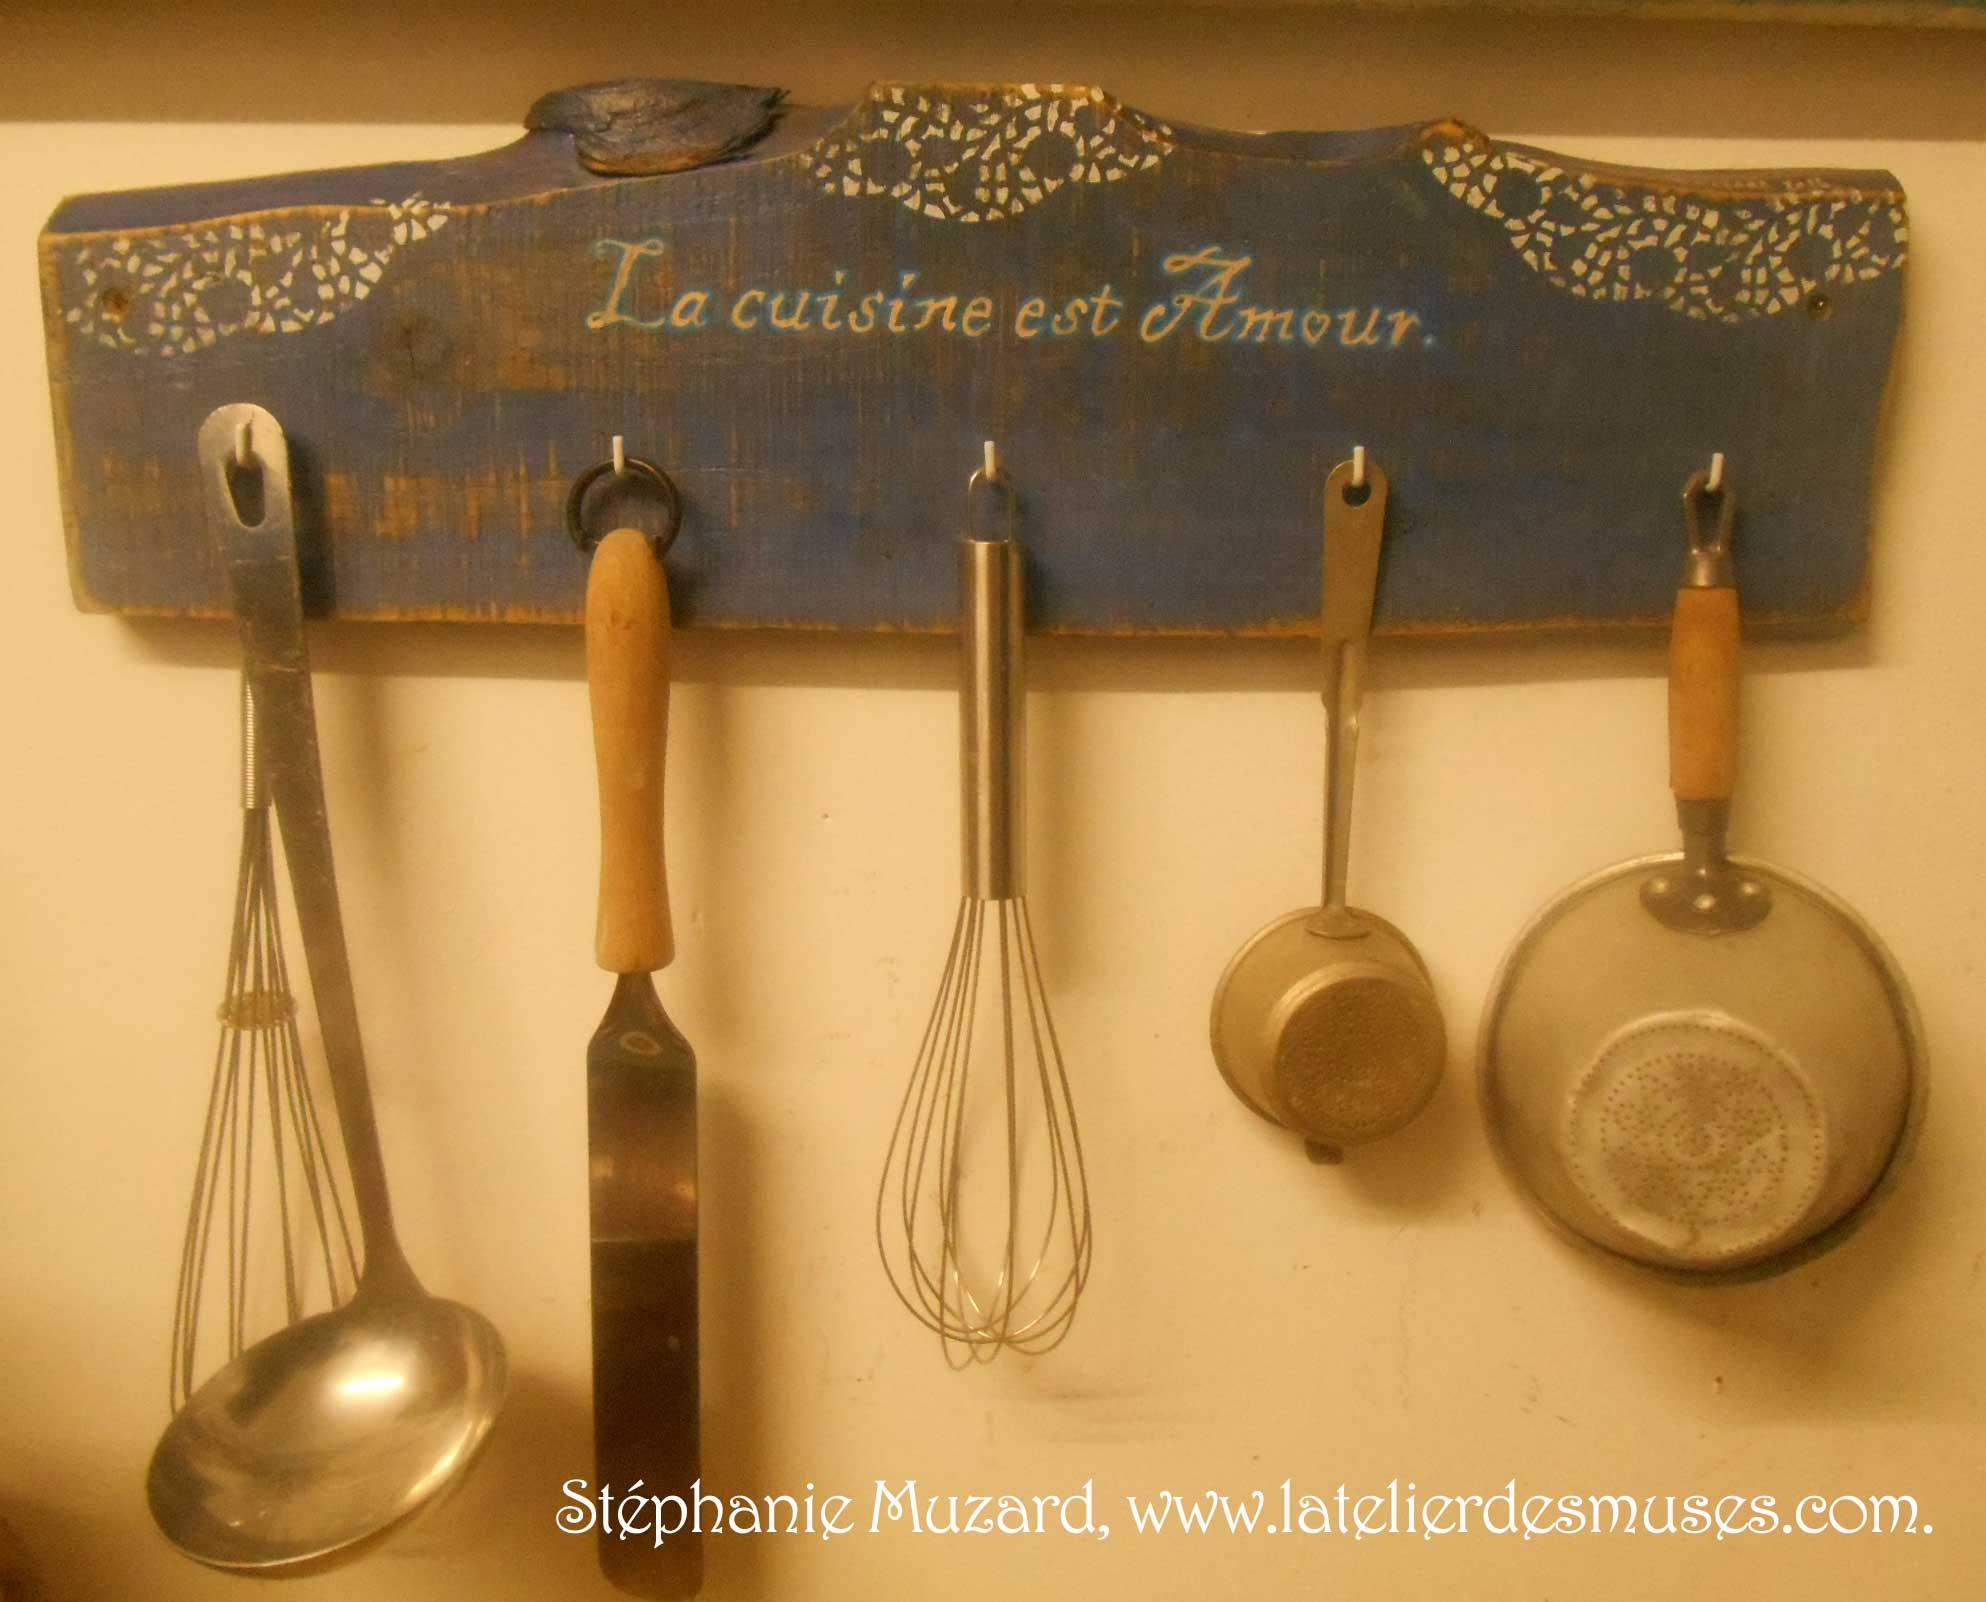 Création d'un porte-ustensiles de cuisine